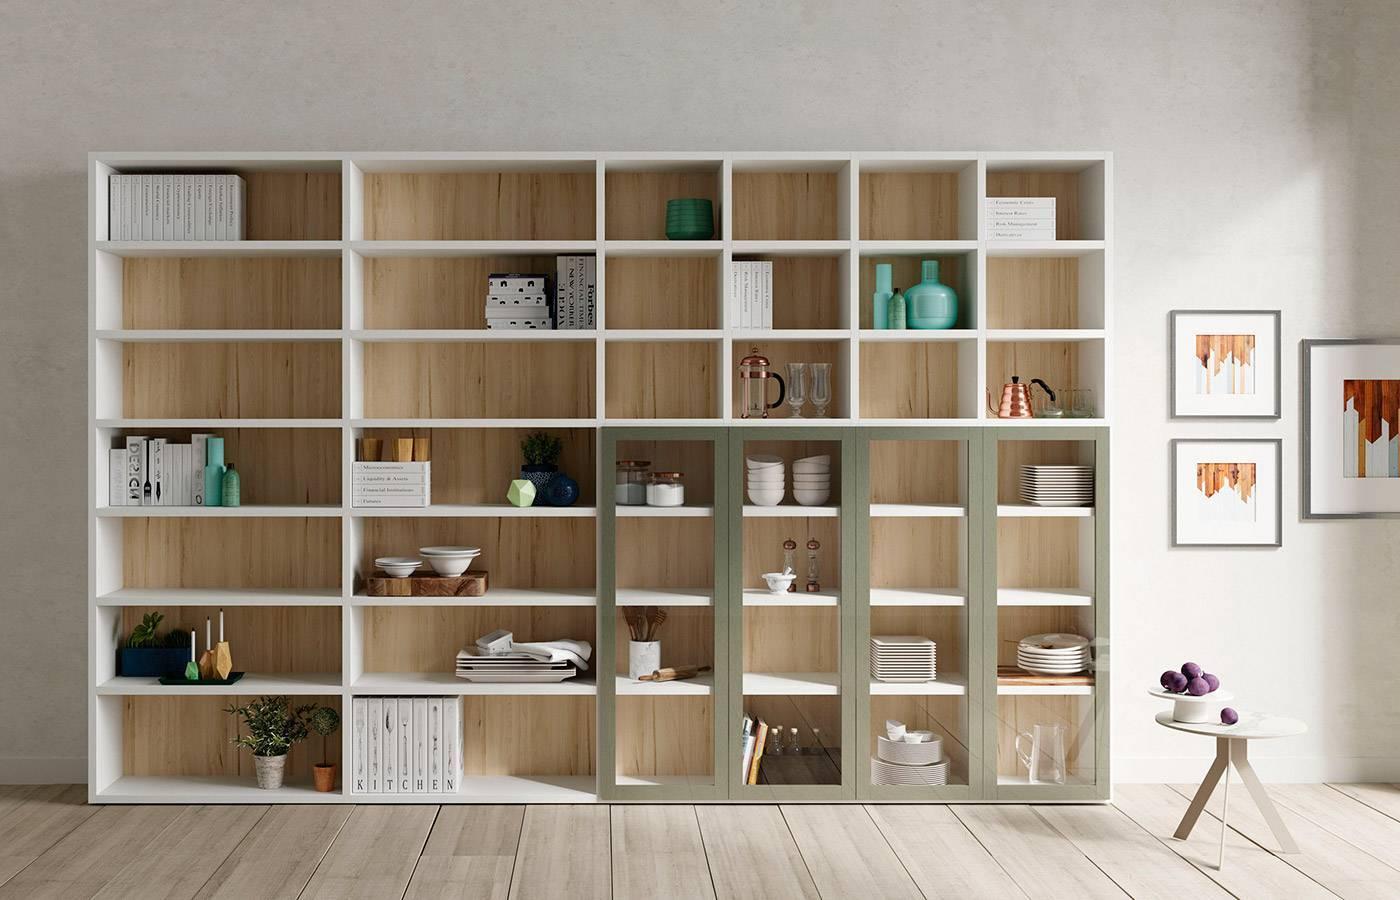 Librería estantería AddBox 3233 de Lagrama